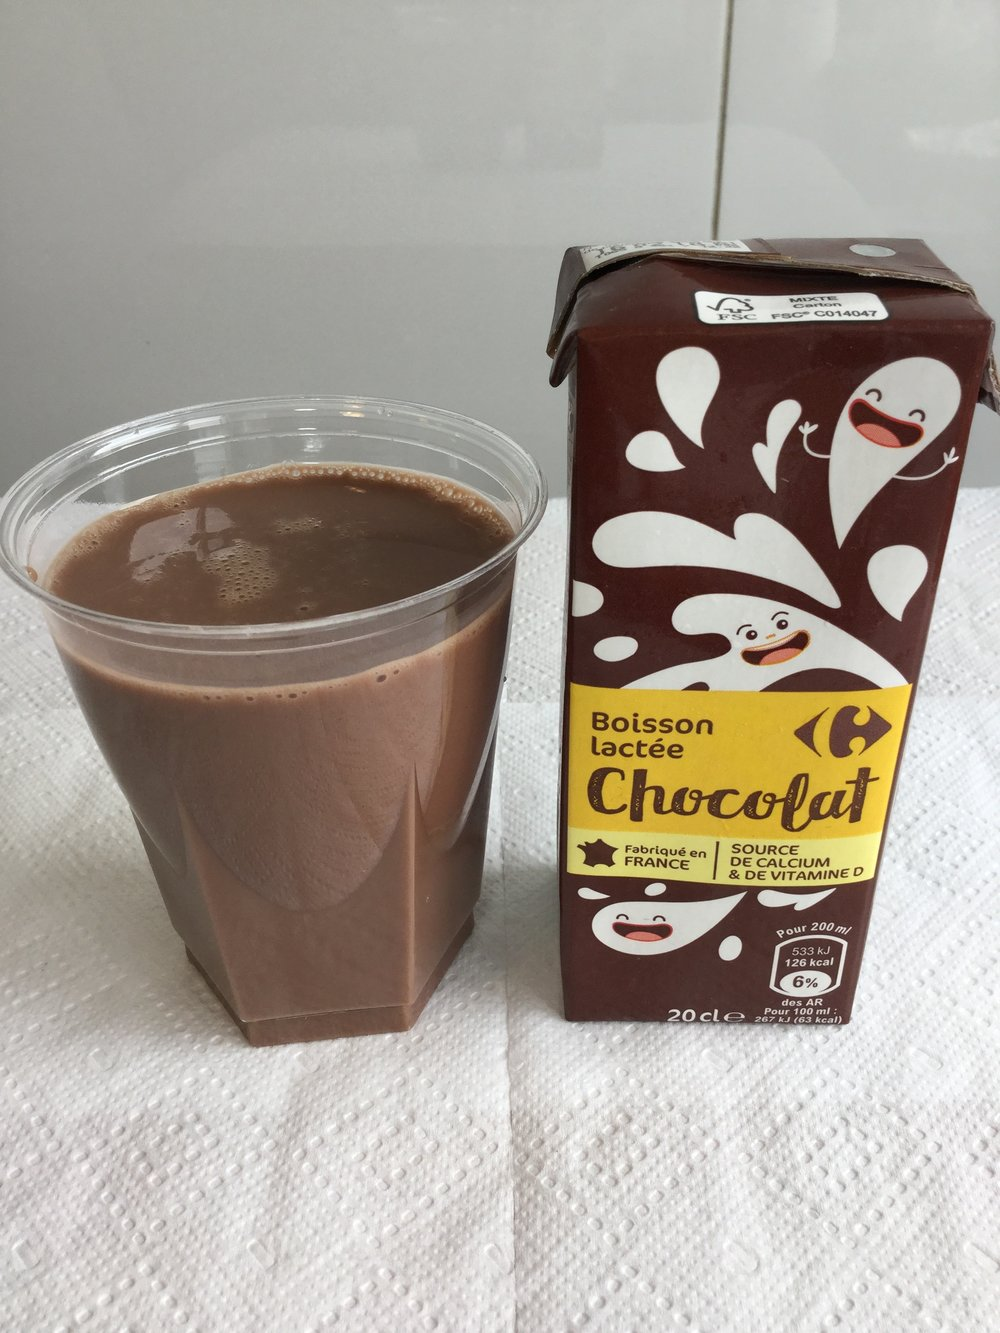 Carrefour Boisson Lactee Chocolat Chocolate Milk Reviews